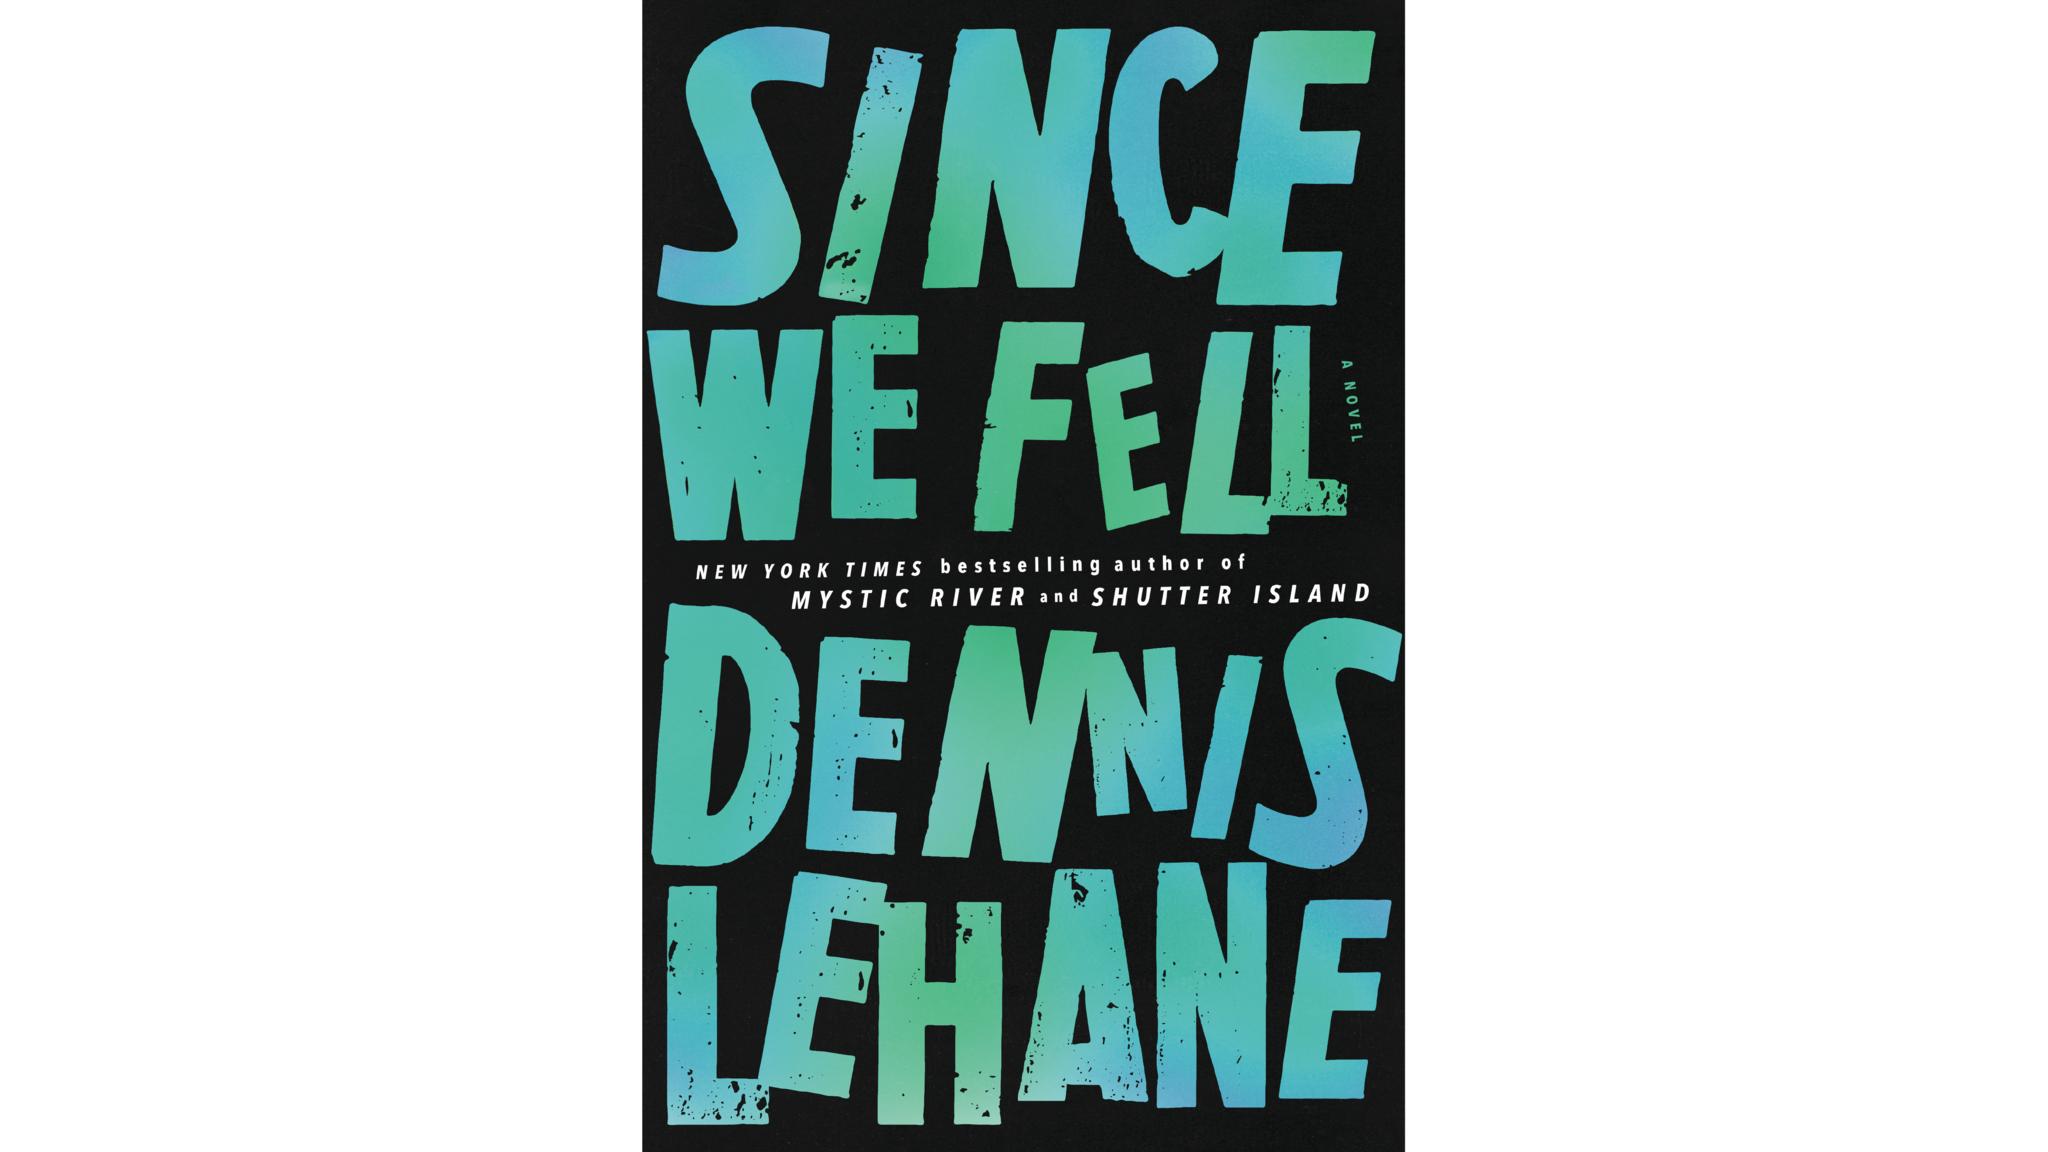 """Since We Fell"" by Dennis Lehane"